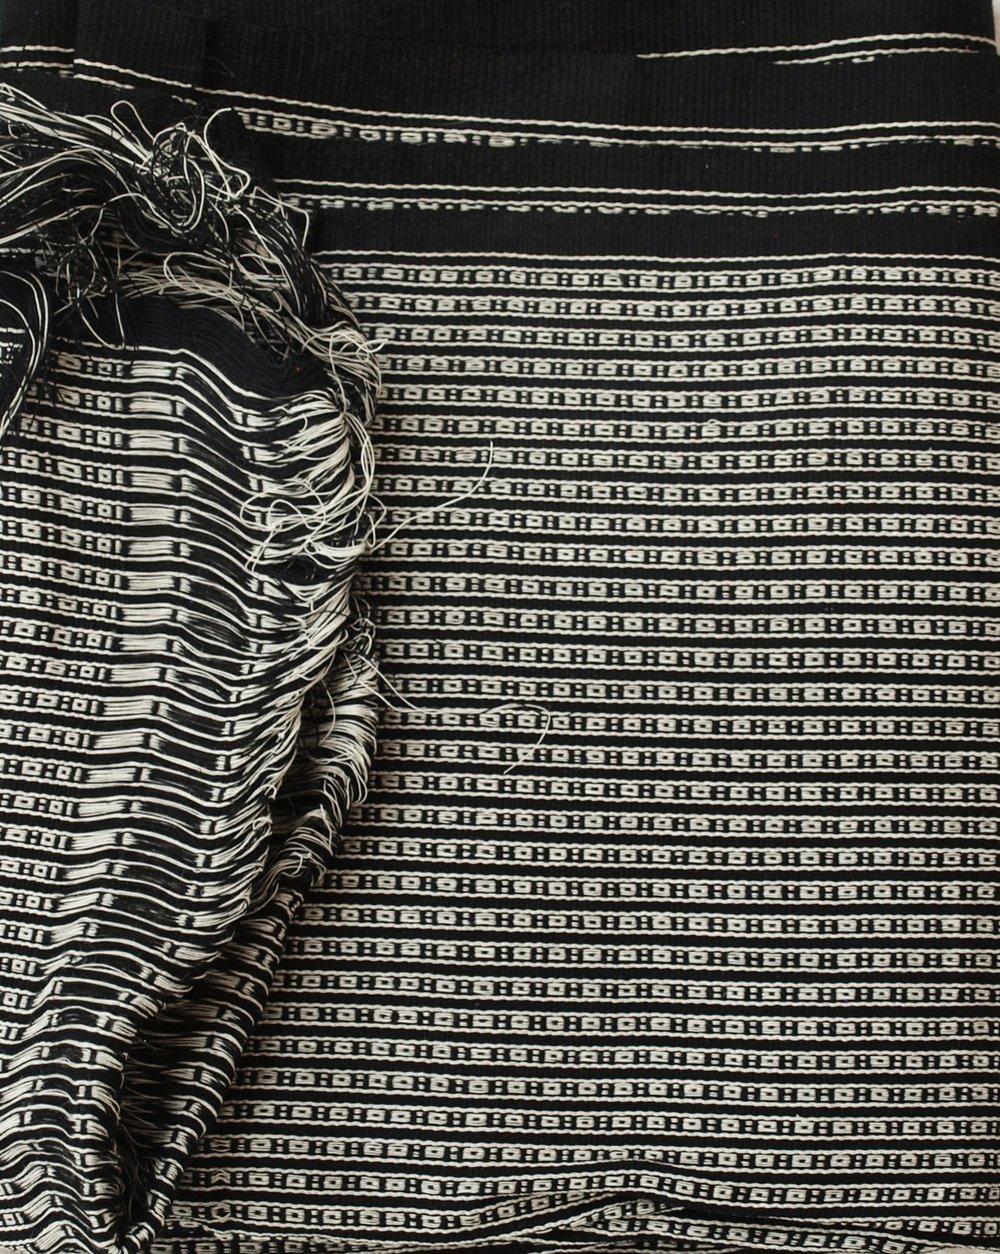 handa_textiles - 5.jpg